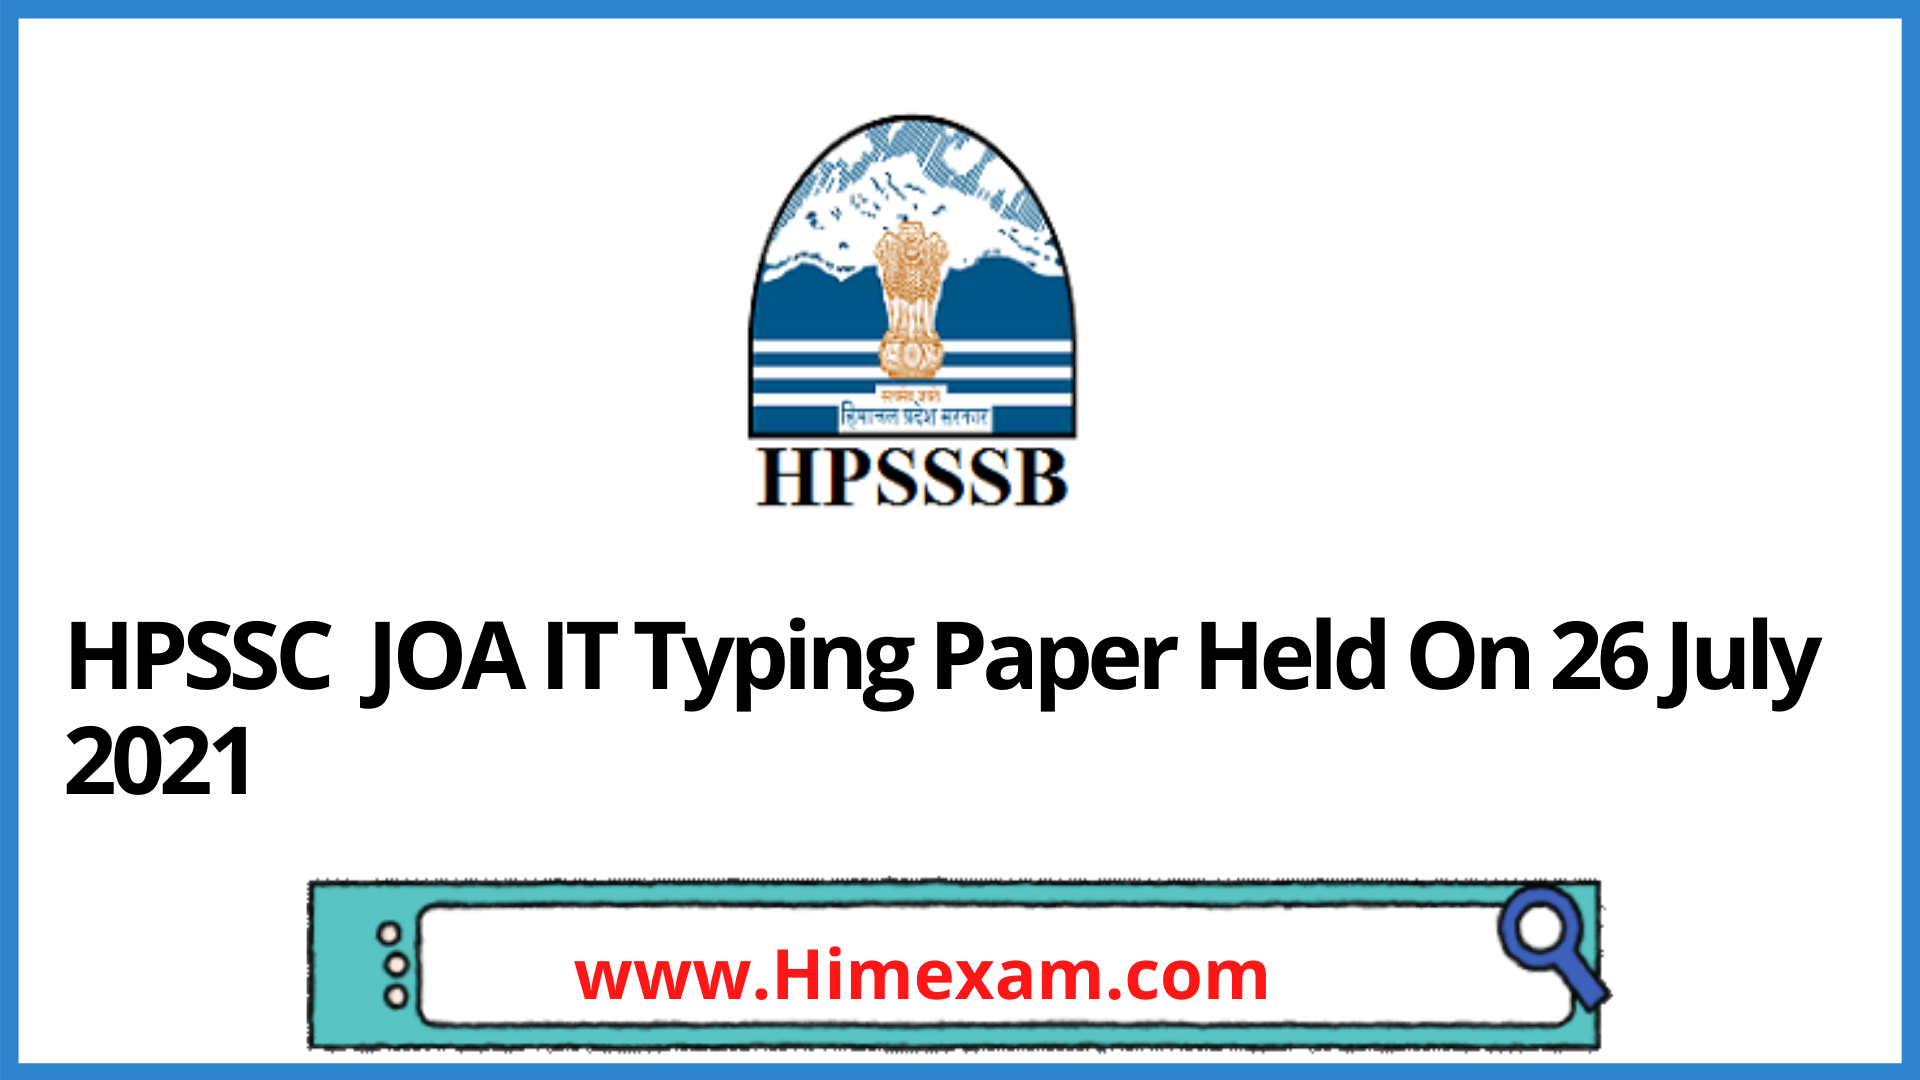 HPSSC JOA IT Typing Paper Held On 26 July 2021